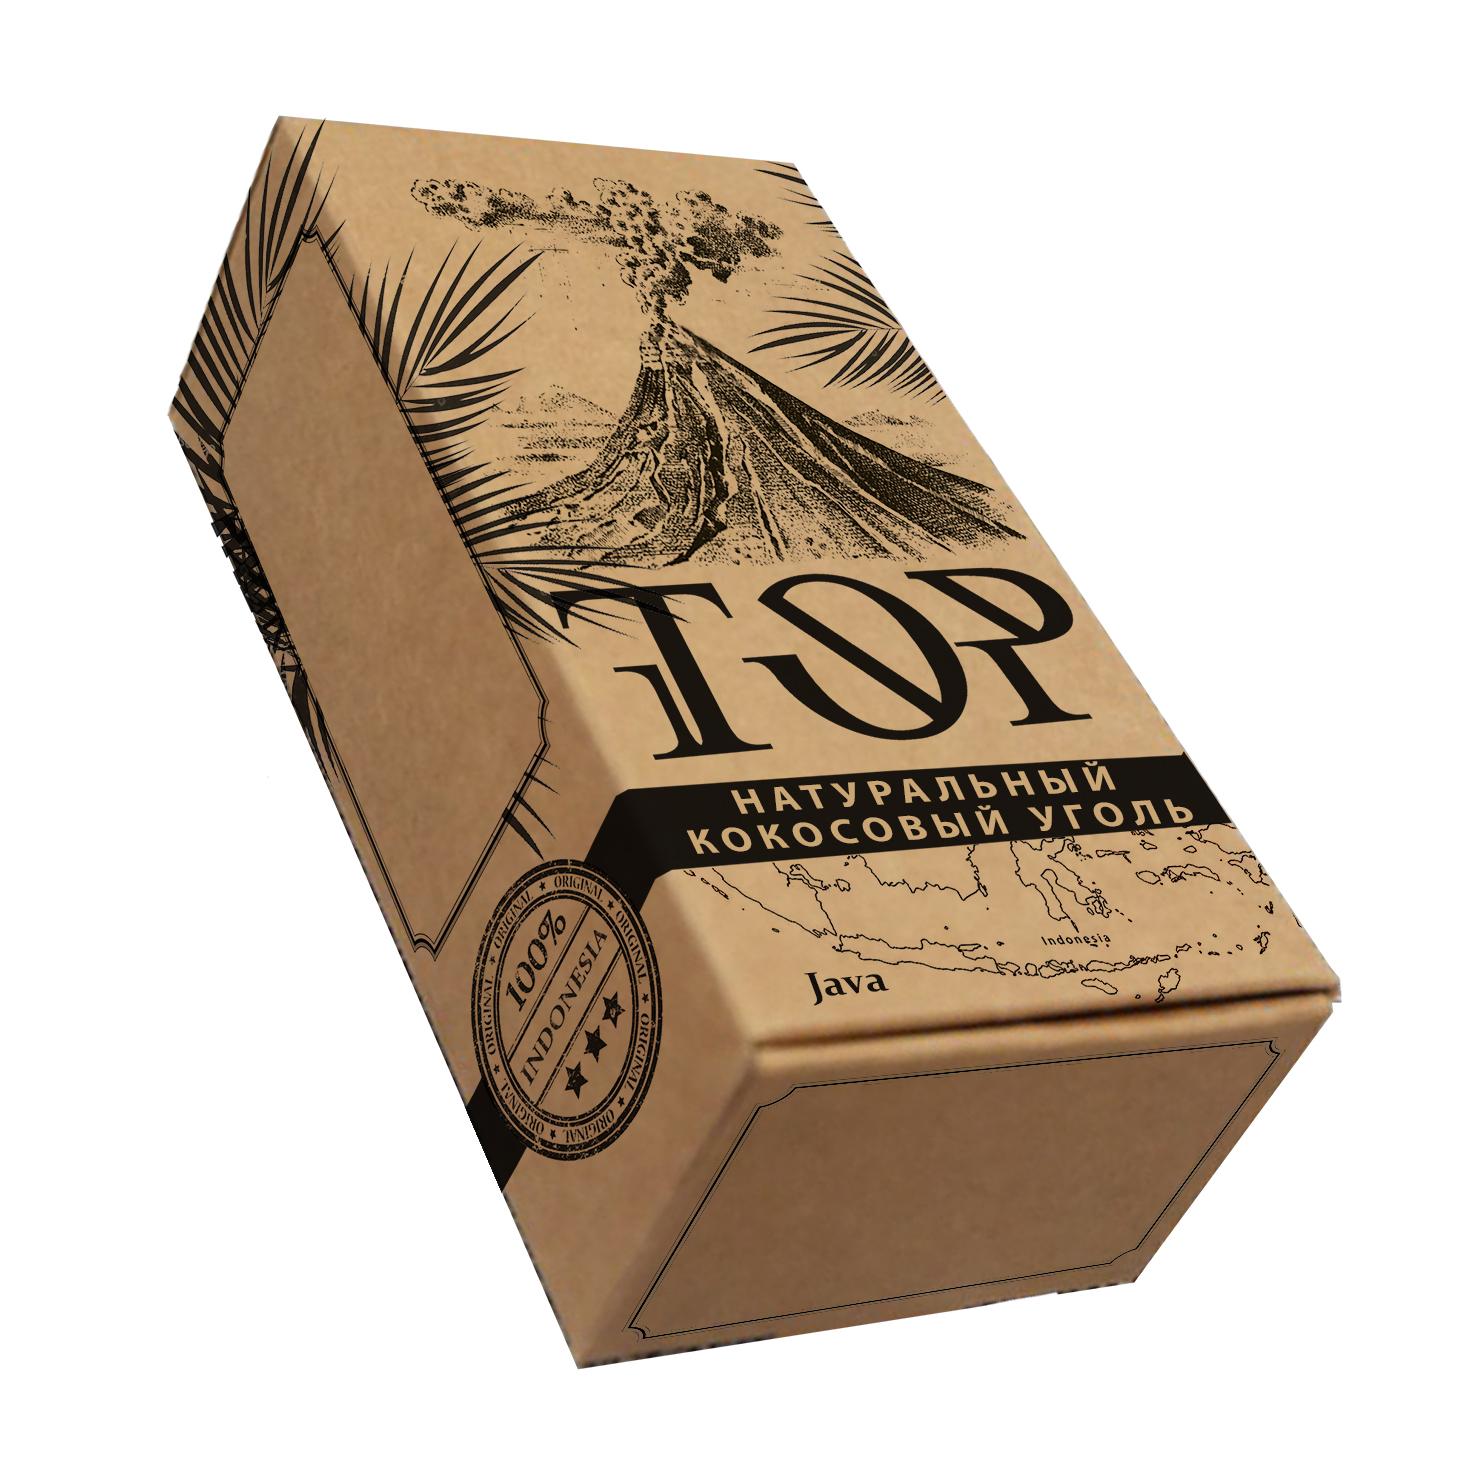 Разработка дизайна коробки, фирменного стиля, логотипа. фото f_3405c5cb12b905c9.jpg